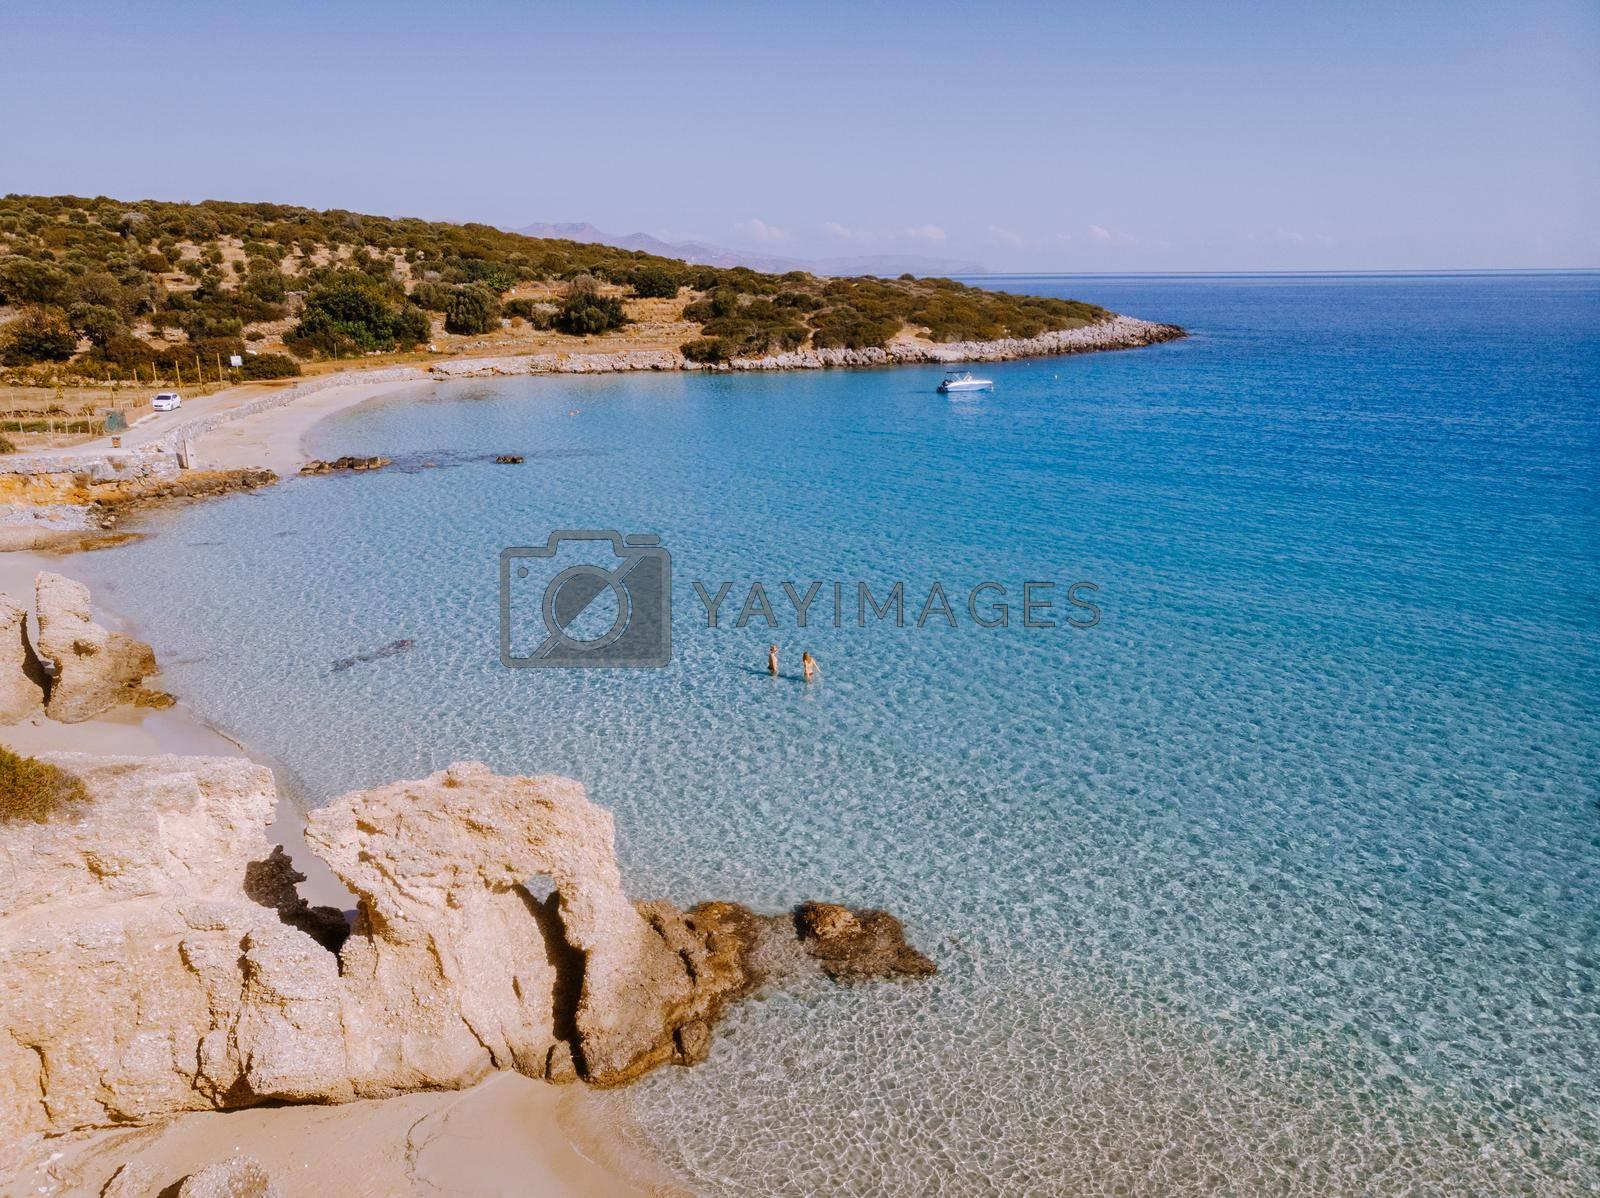 Tropical beach of Voulisma beach, Istron, Crete, Greece ,Most beautiful beaches of Crete island -Istron bay near Agios Nikolaos drone aerial view